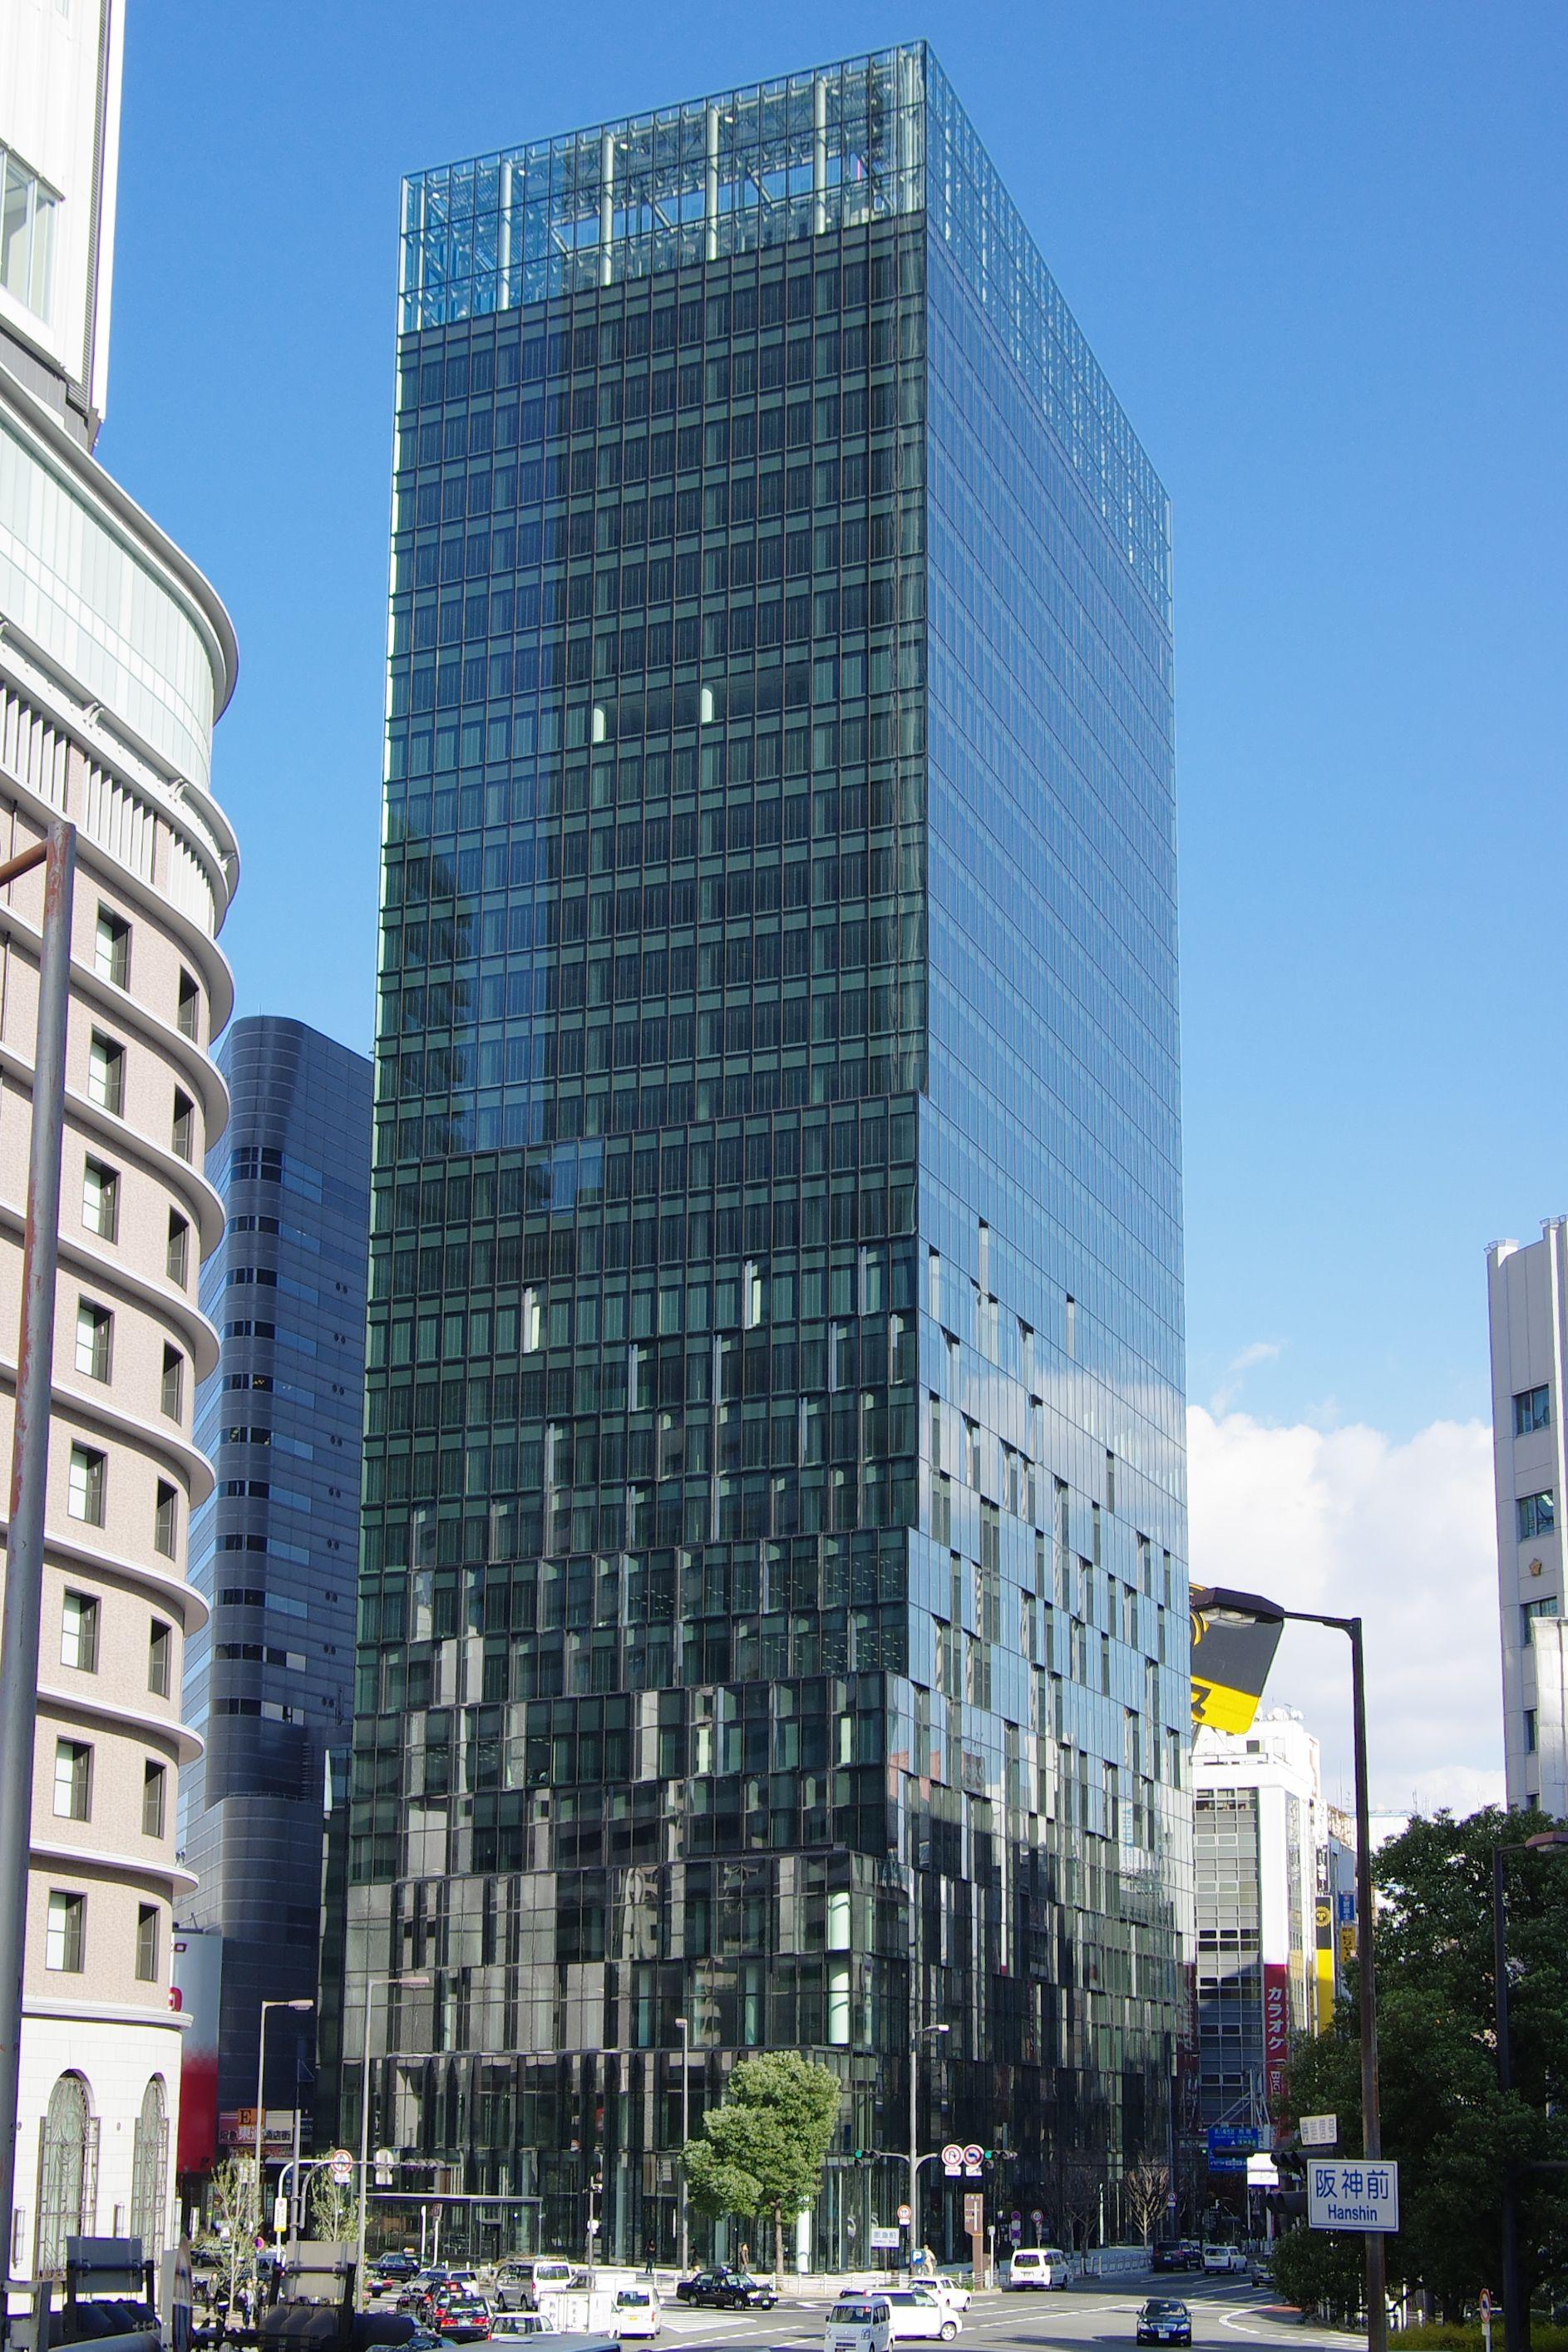 Dominique Perrault  Fukoku Tower, Japan